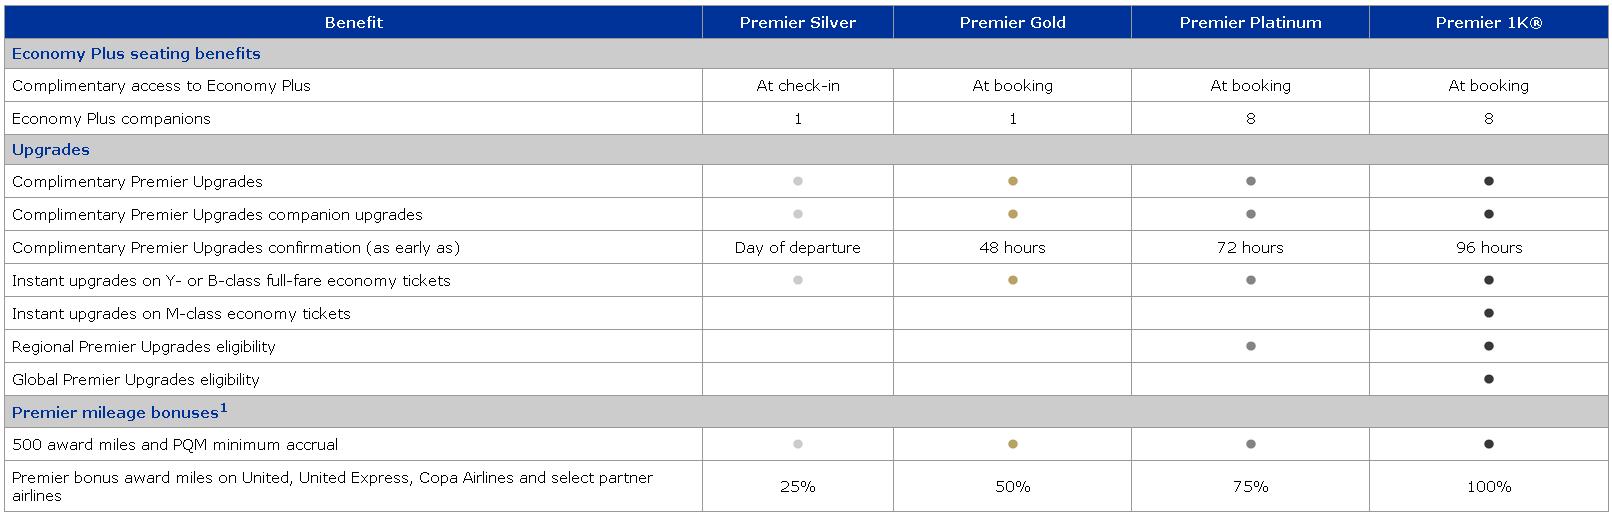 Premier MileagePlus benefits chart